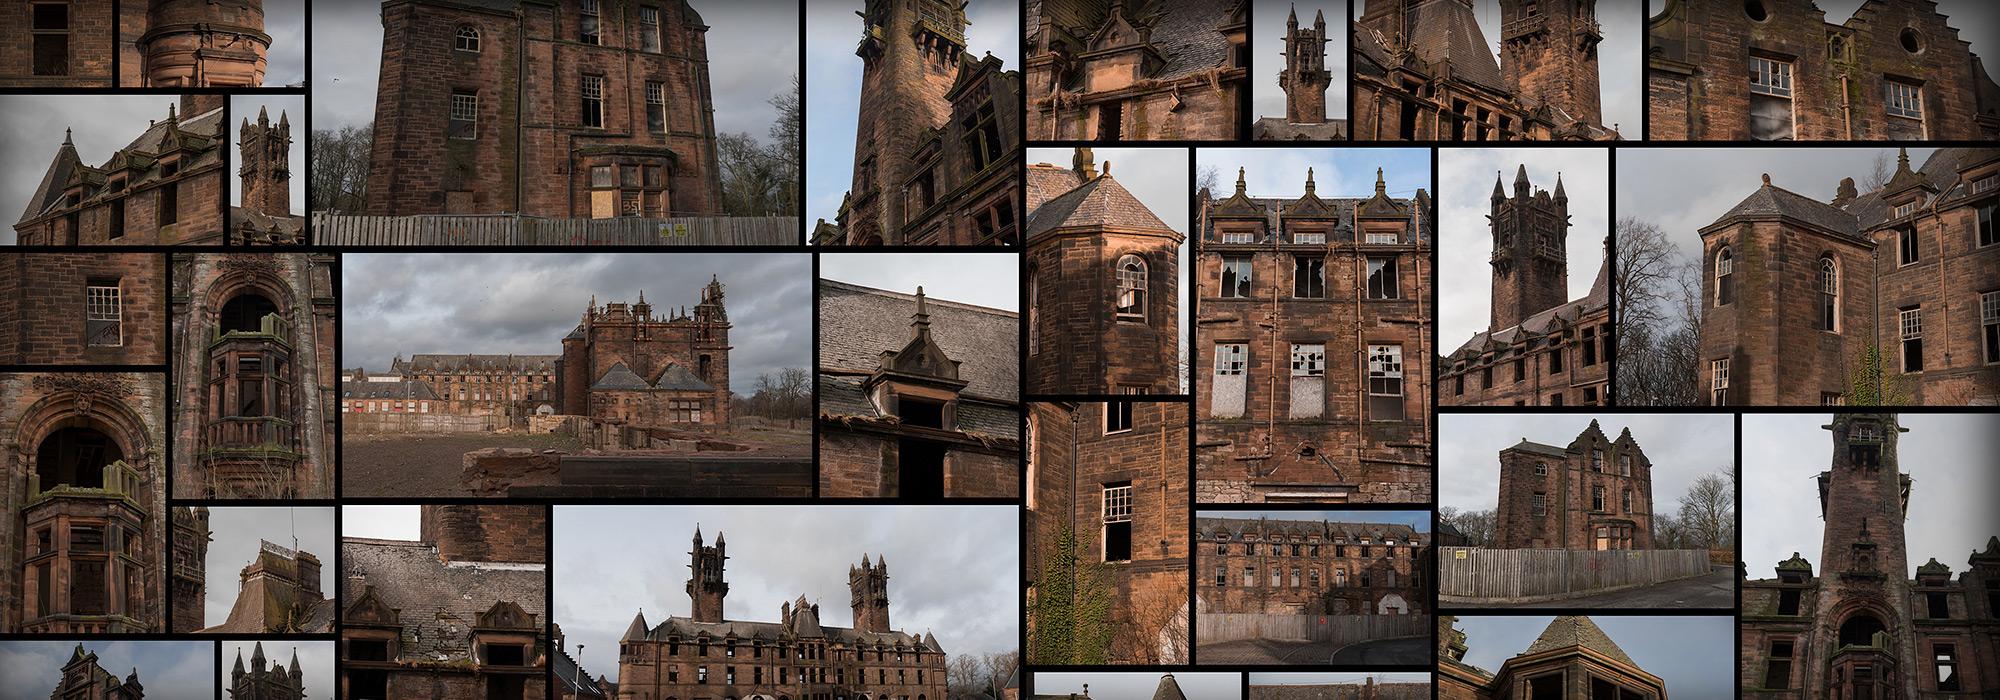 AbandonedAsylumScotlandUrbex